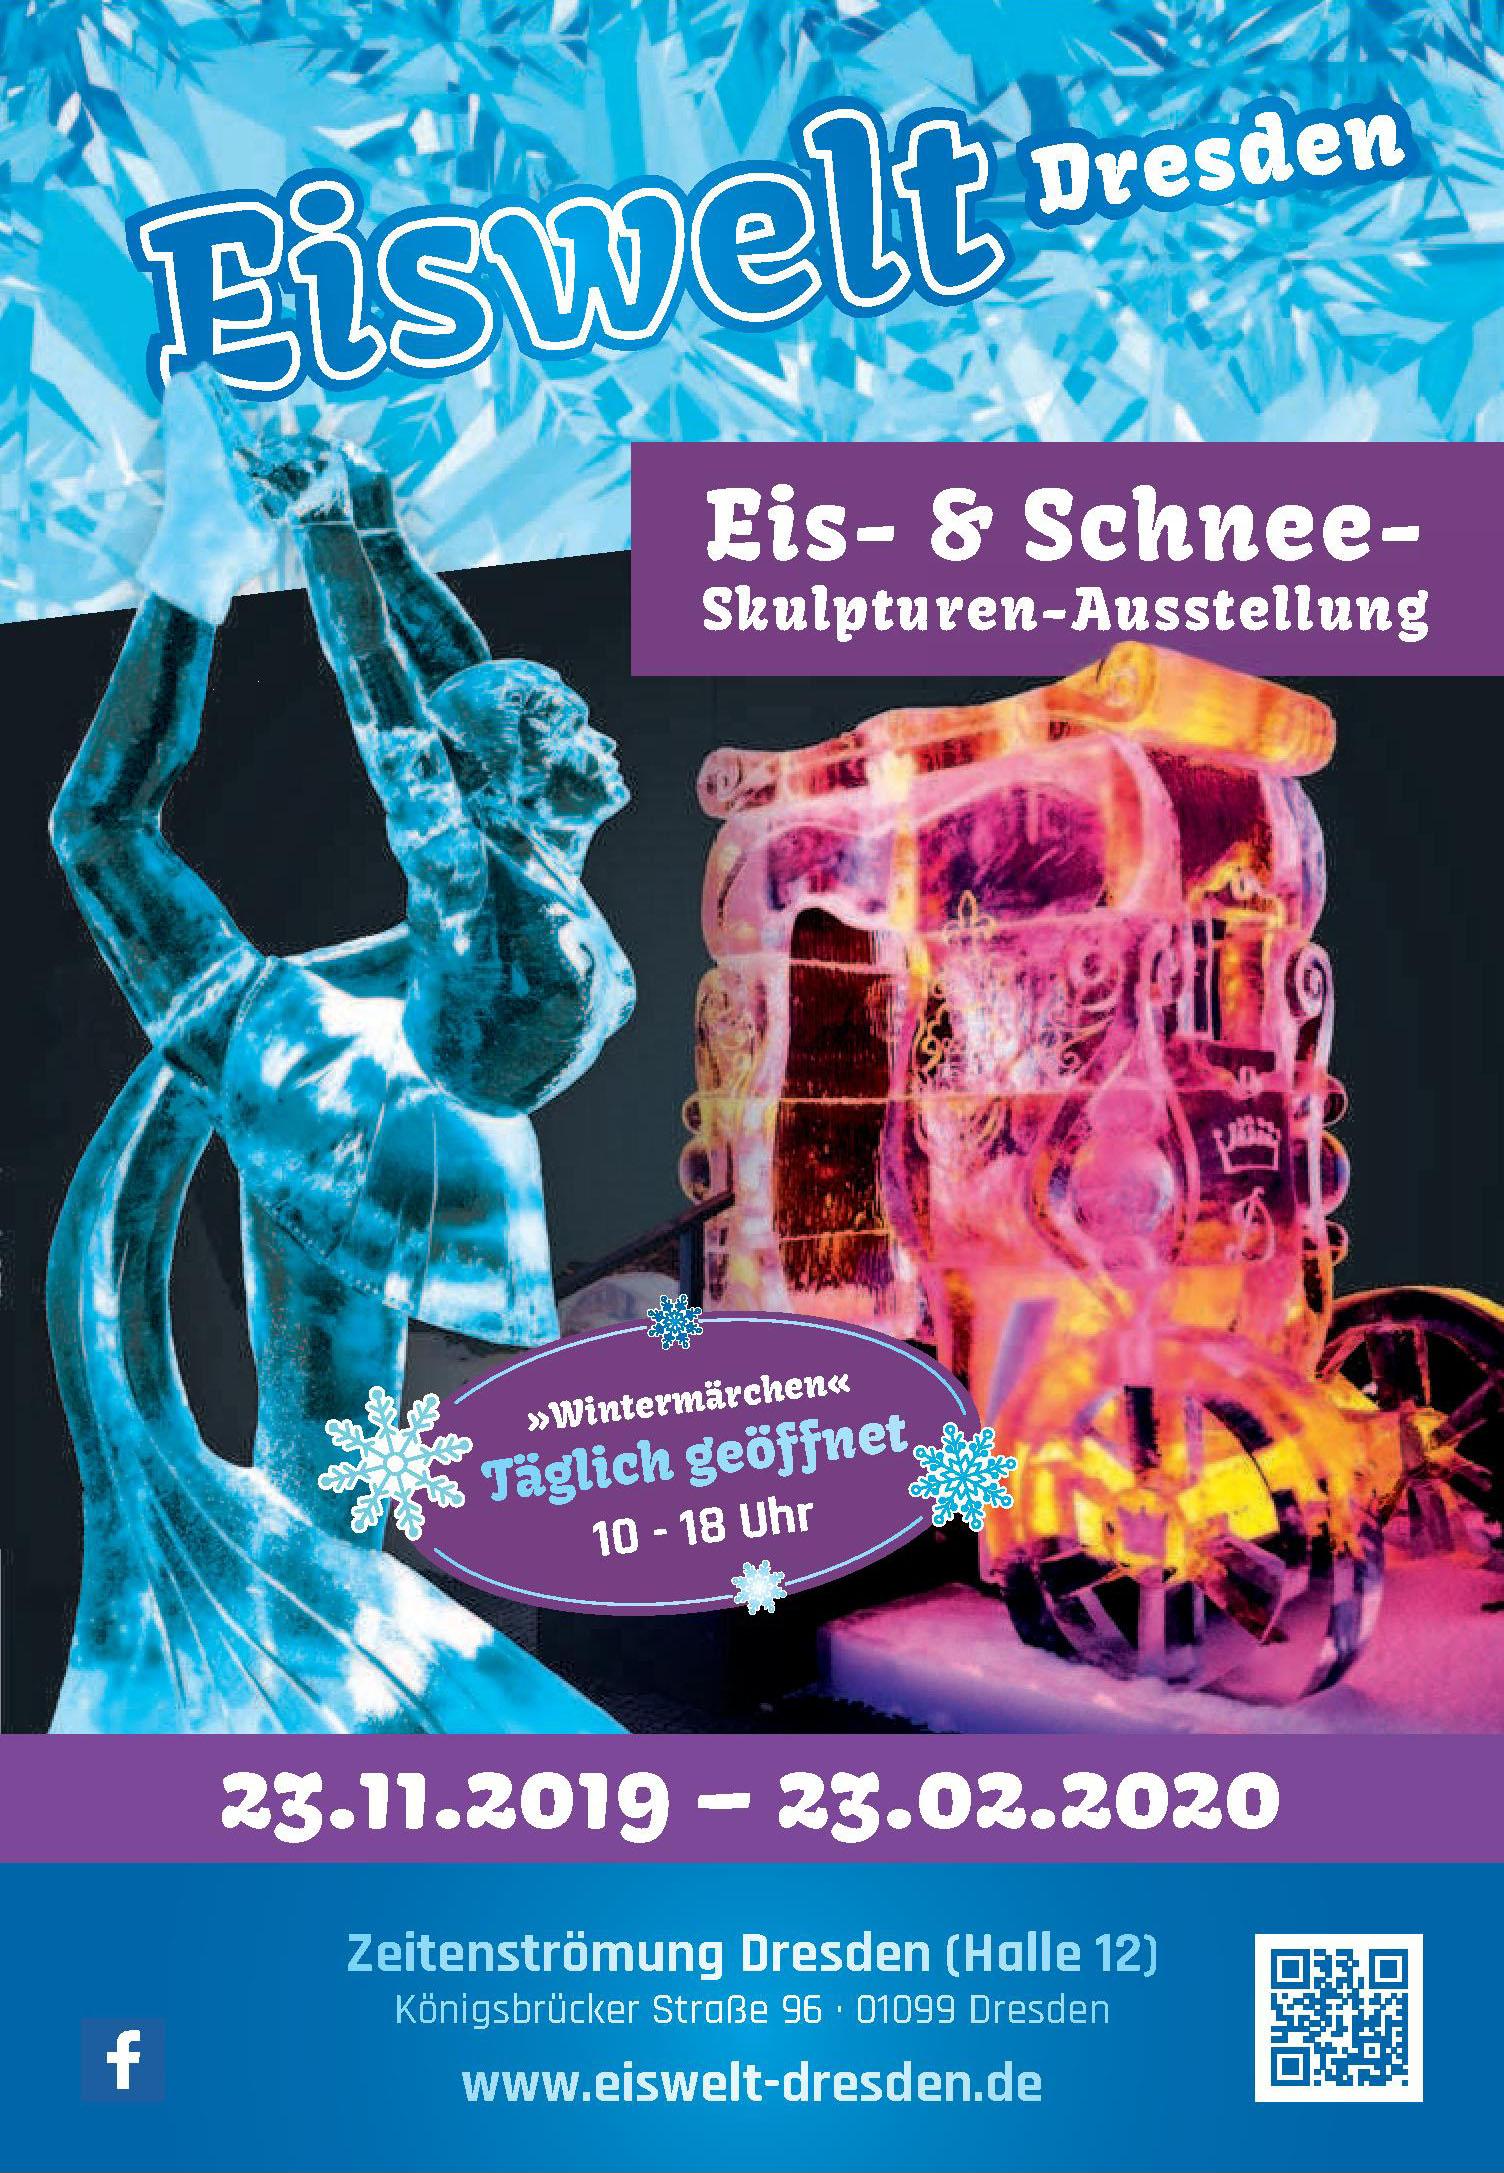 Eiswelt Dresden